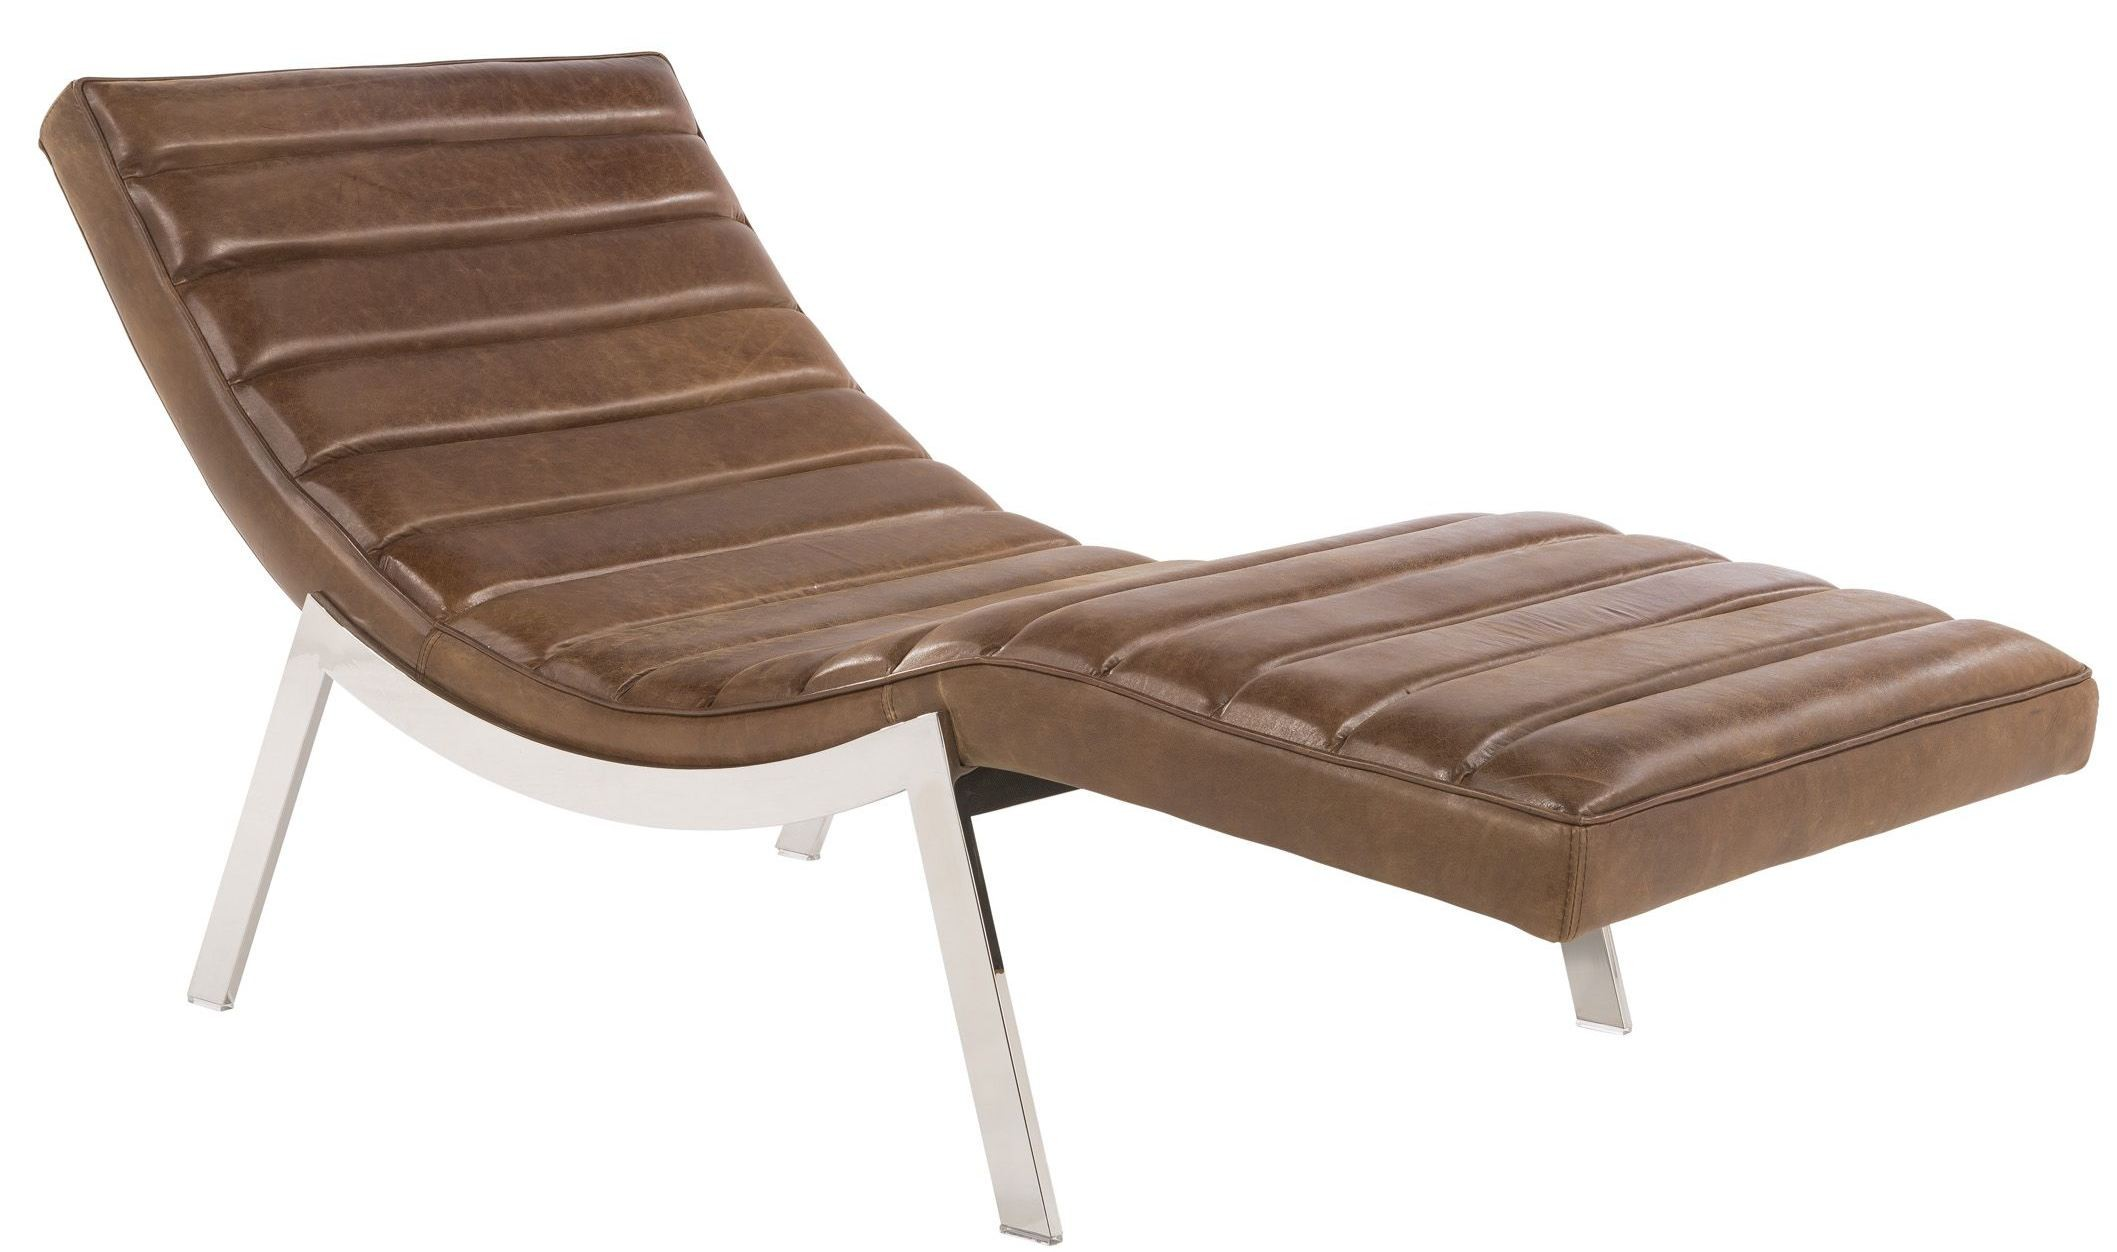 Benedict profundo sepia brown leather chaise 100680 for Brown leather chaise